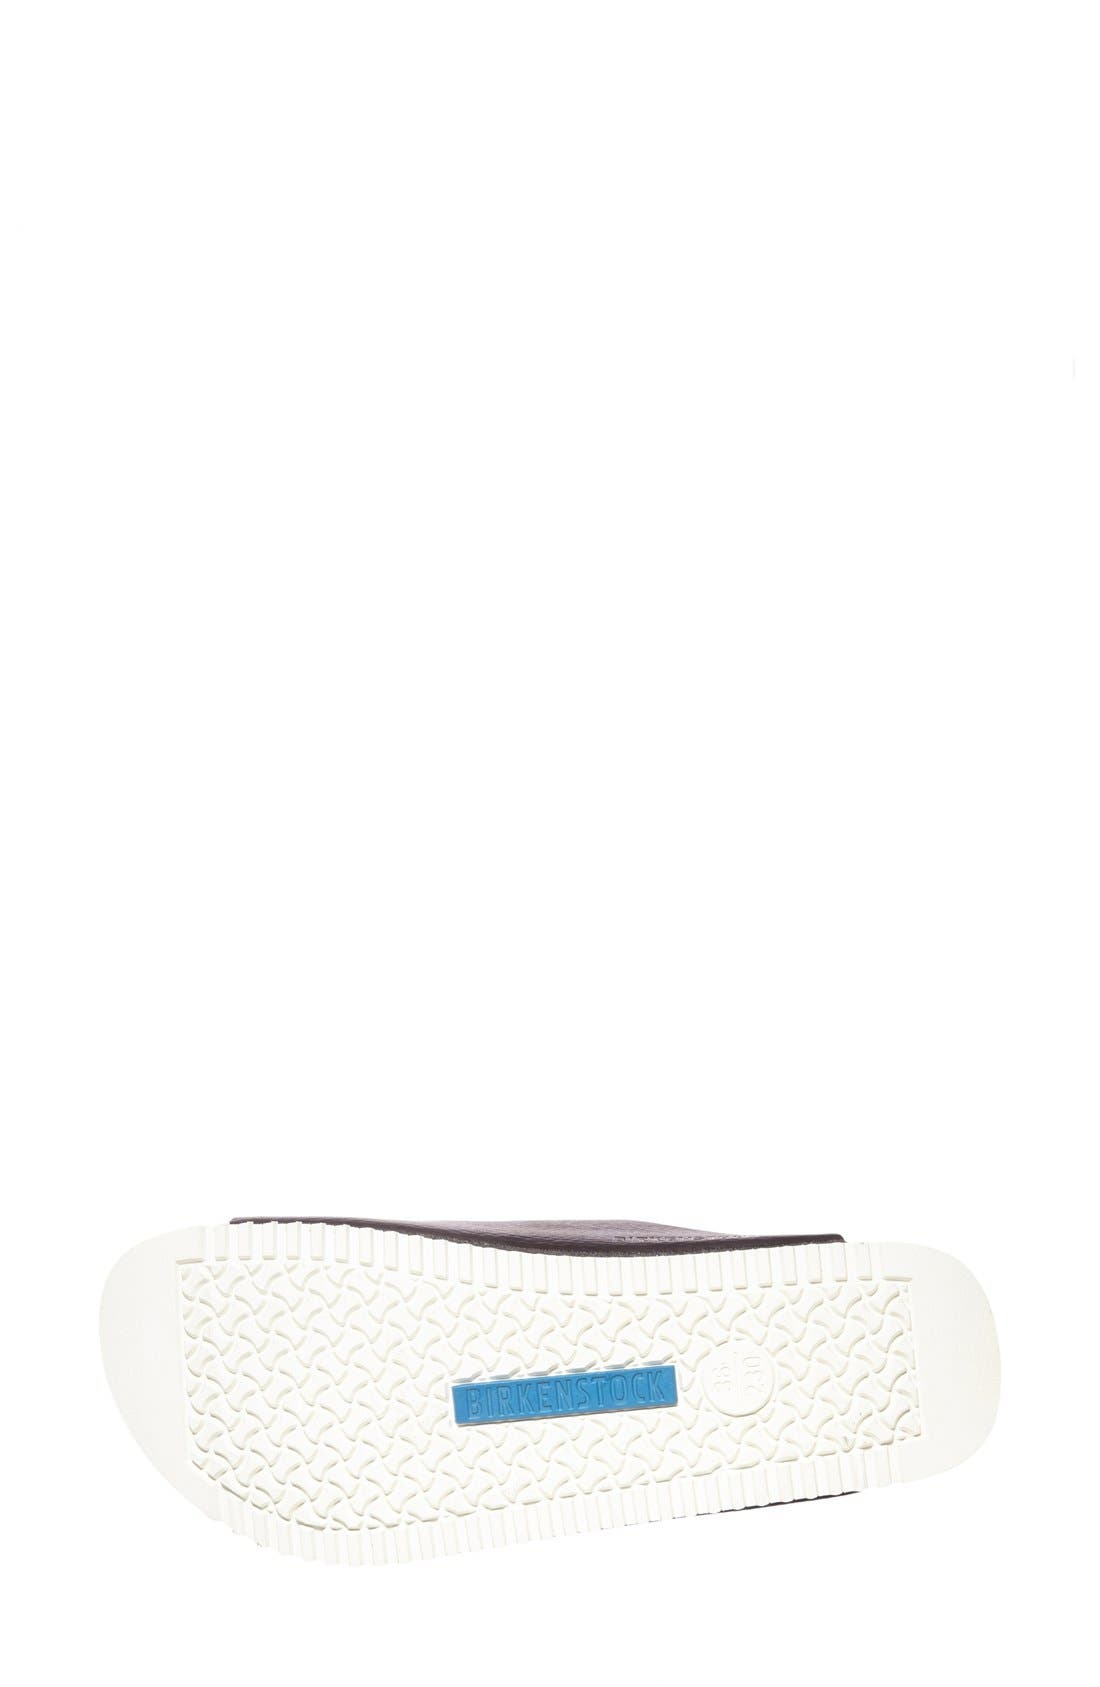 BIRKENSTOCK,                             'Arizona' Leather Double Band Footbed Sandal,                             Alternate thumbnail 2, color,                             001